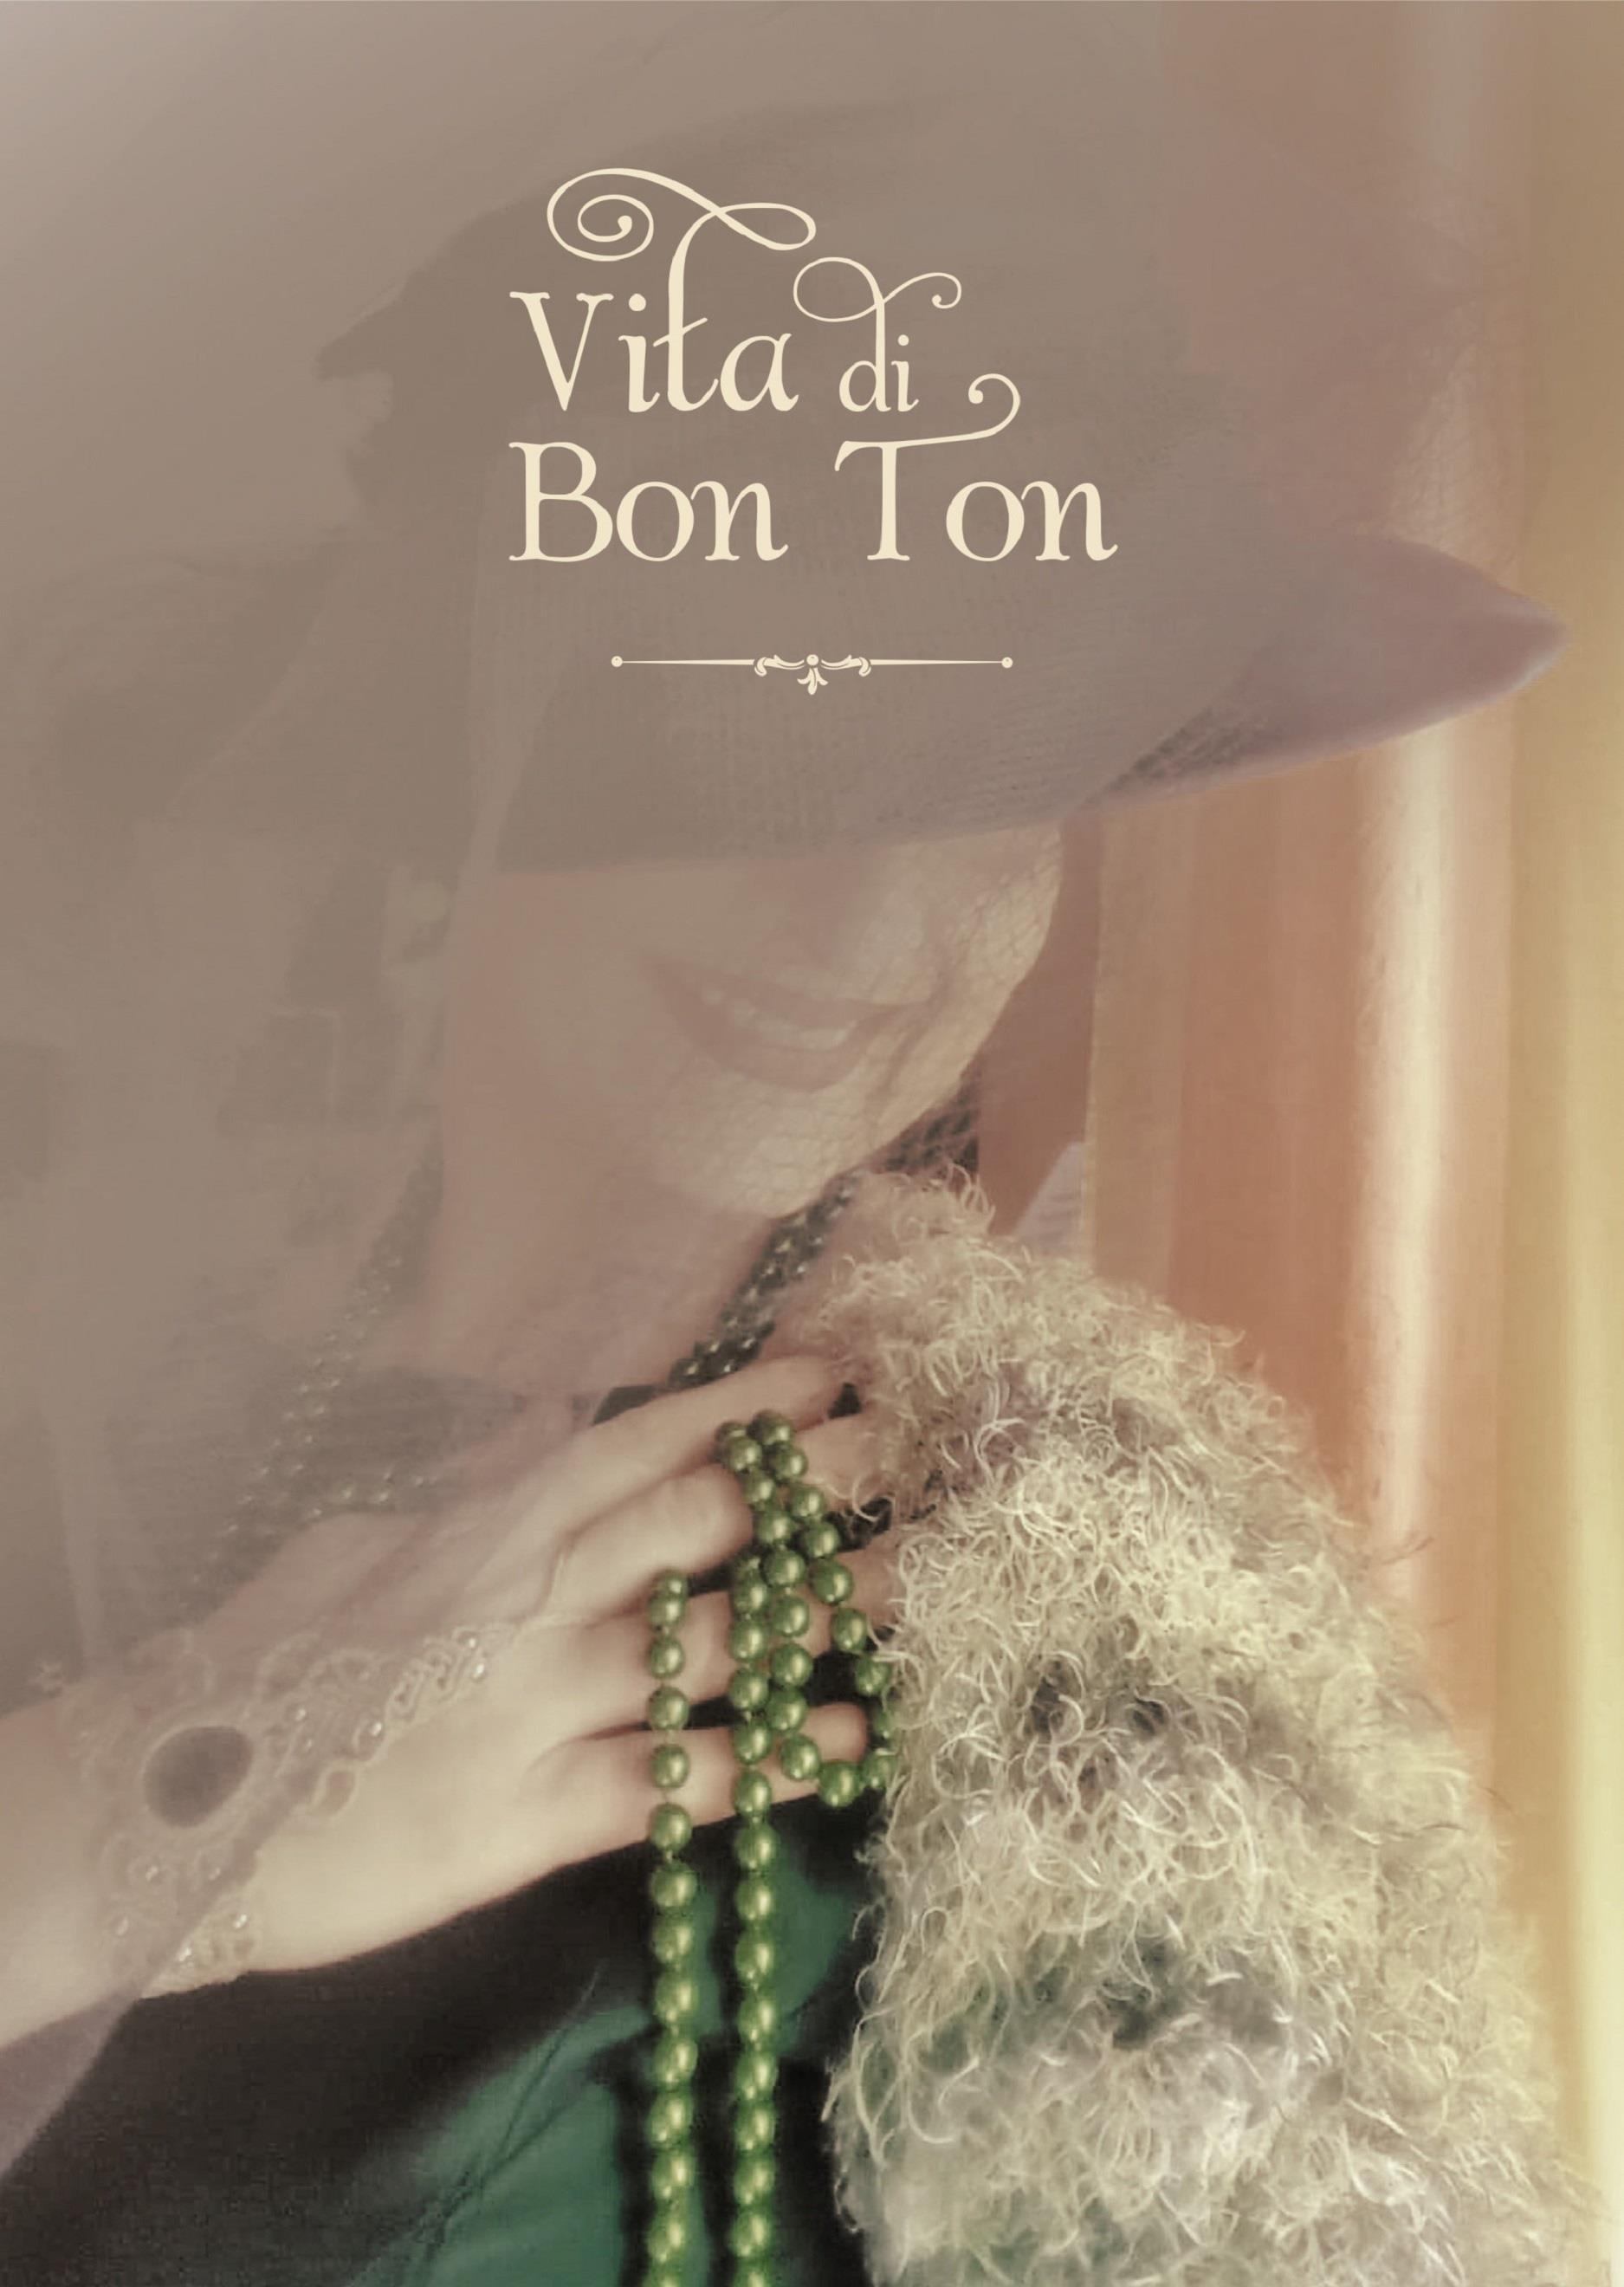 Vita di Bon Ton